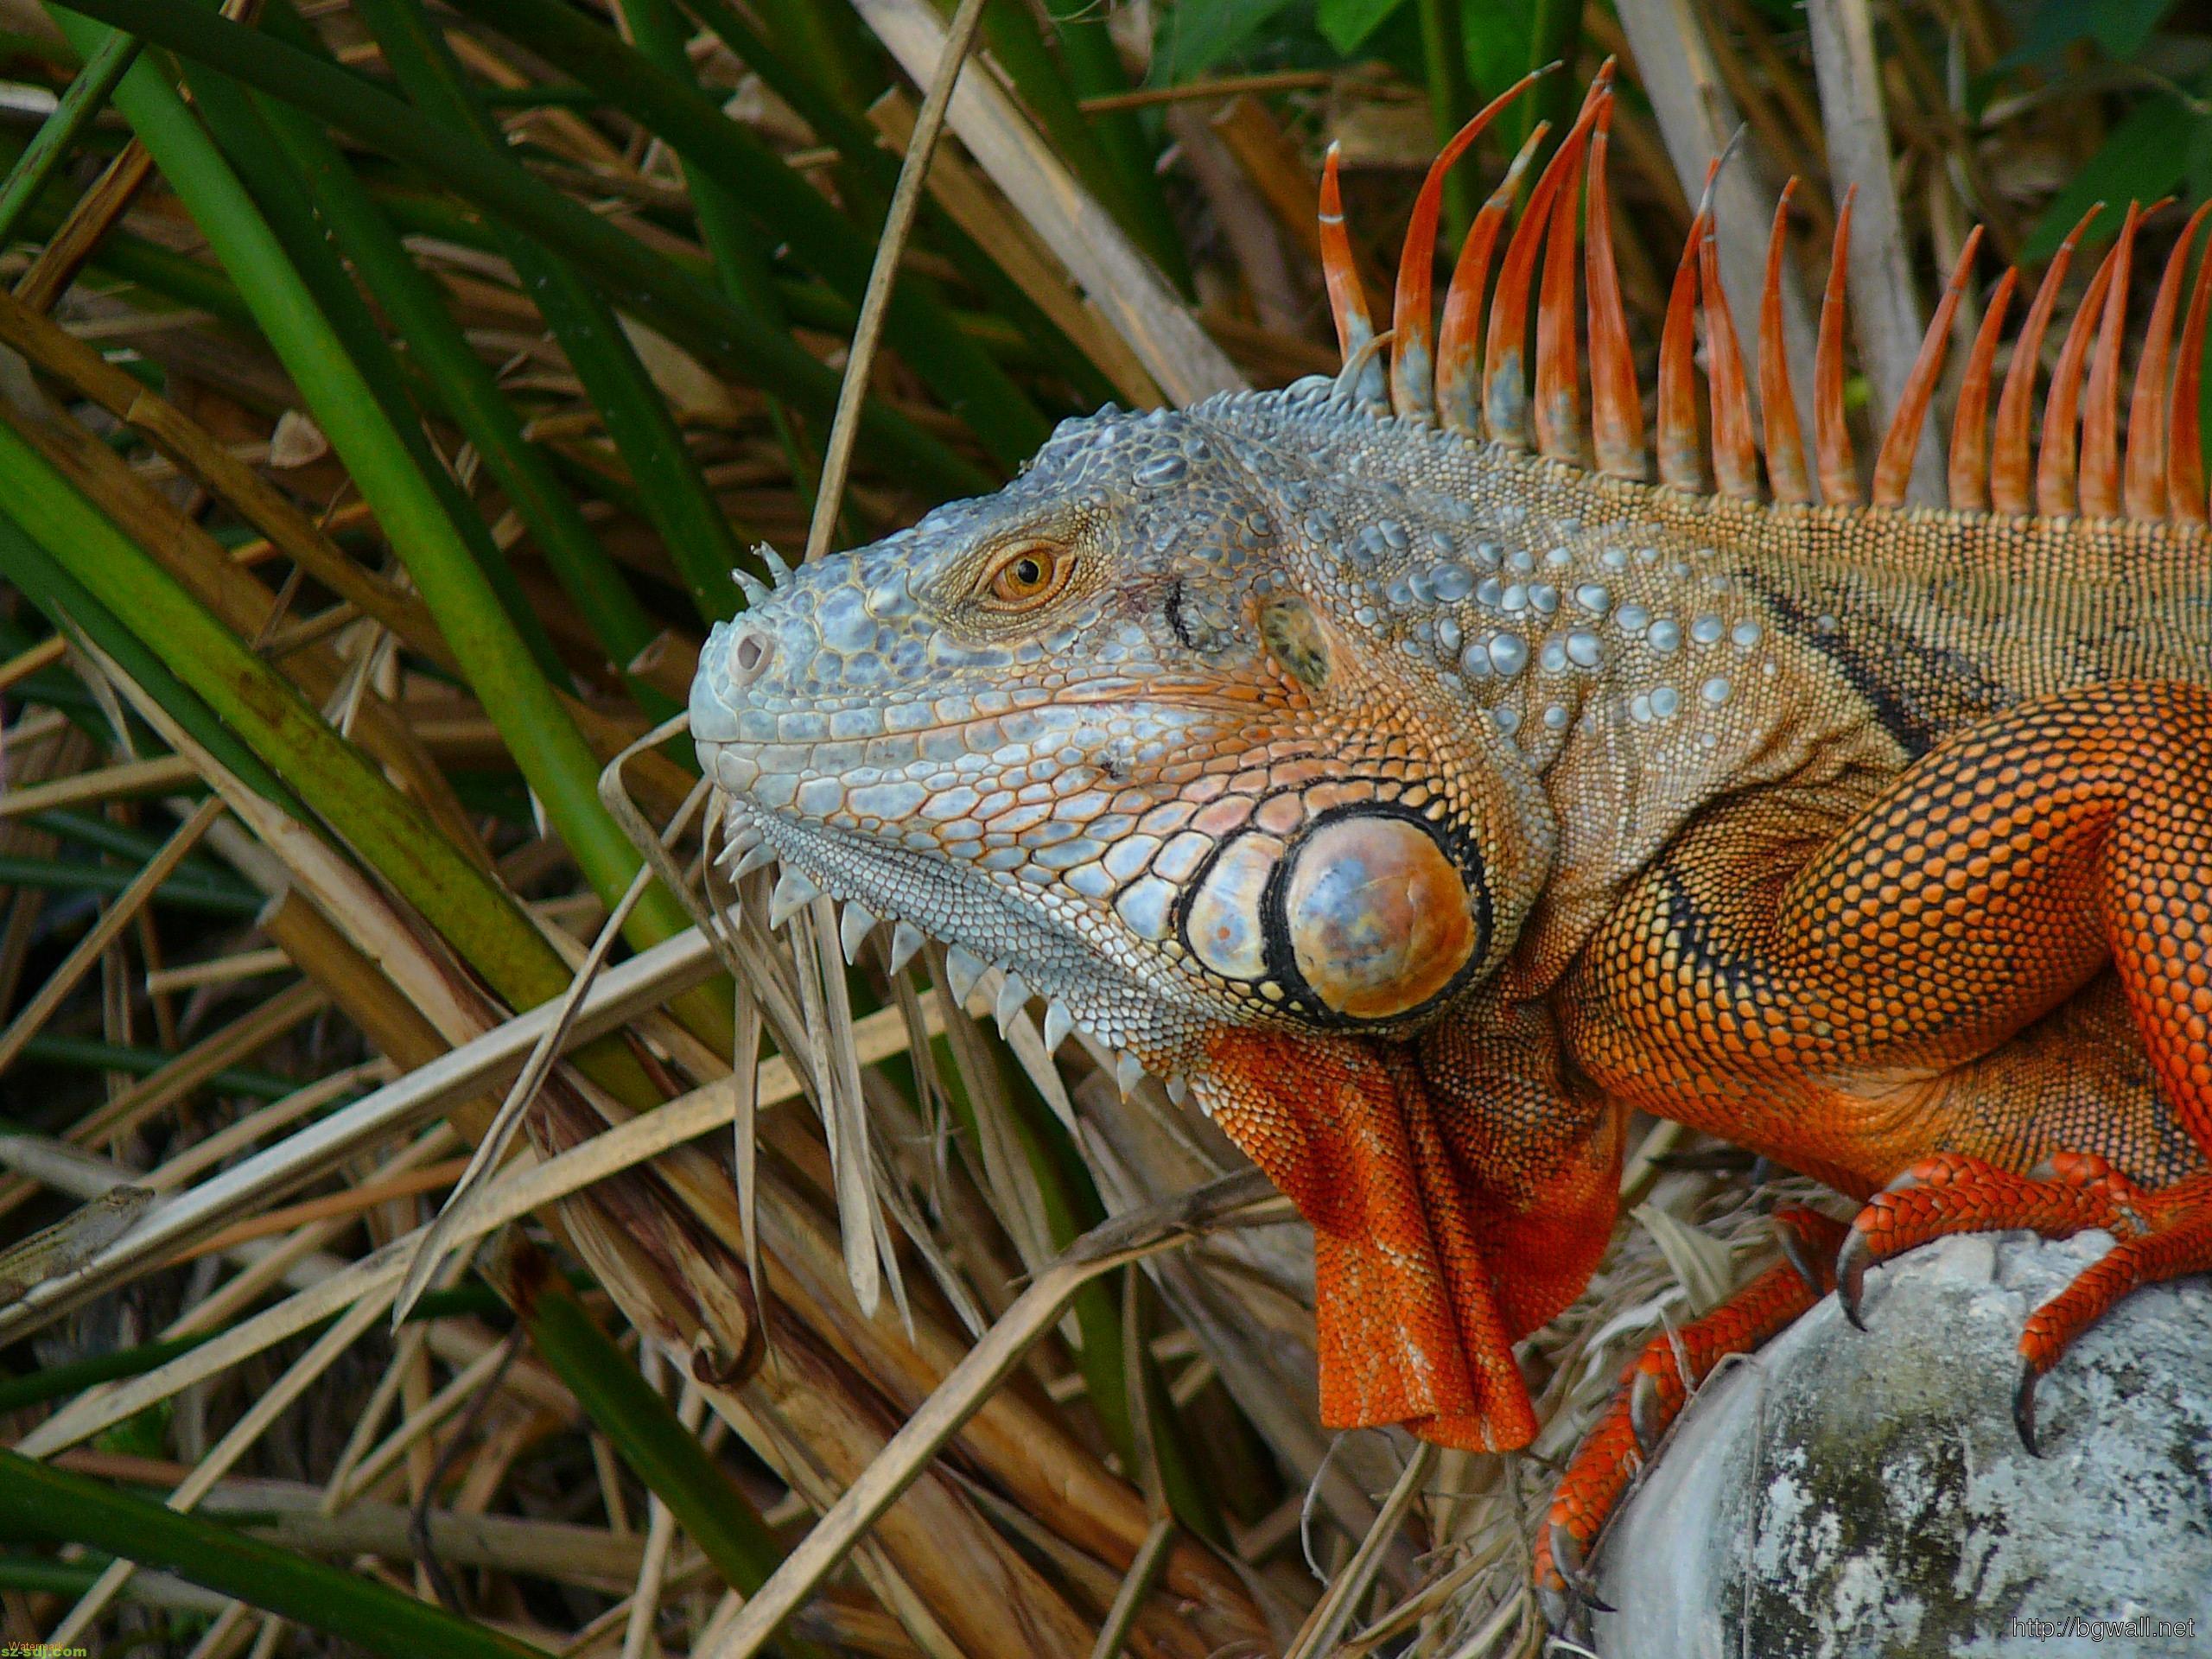 an-iguana-crept-behind-a-bush-wallpaper-image-hd